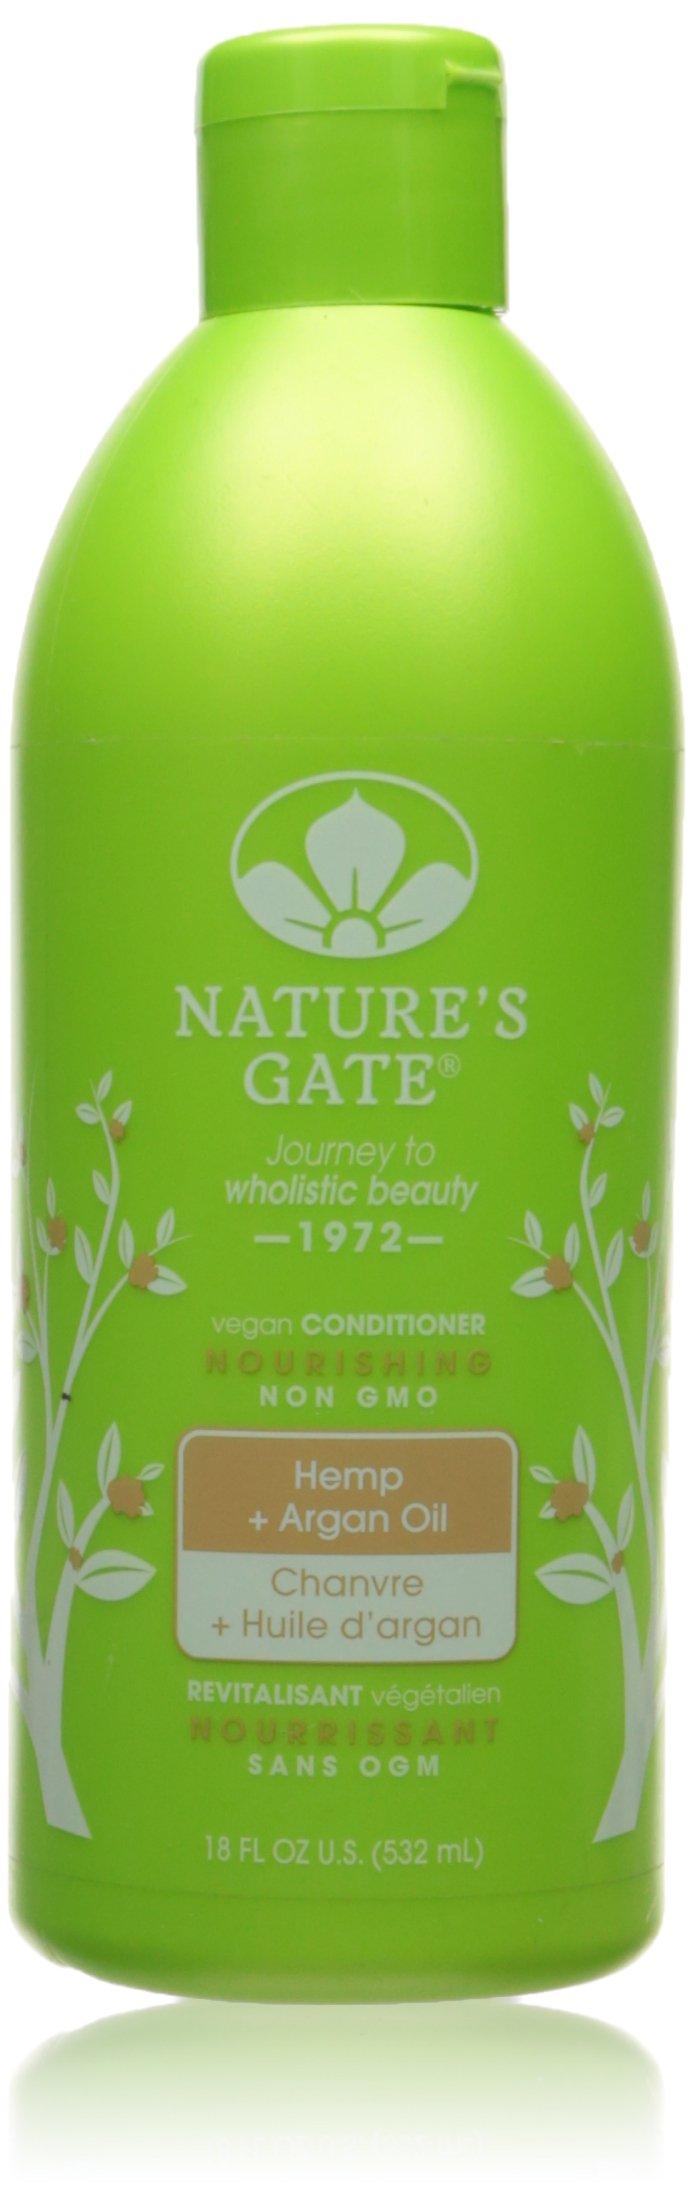 Amazon Com Nature S Gate Nourishing Shampoo For Dry Or